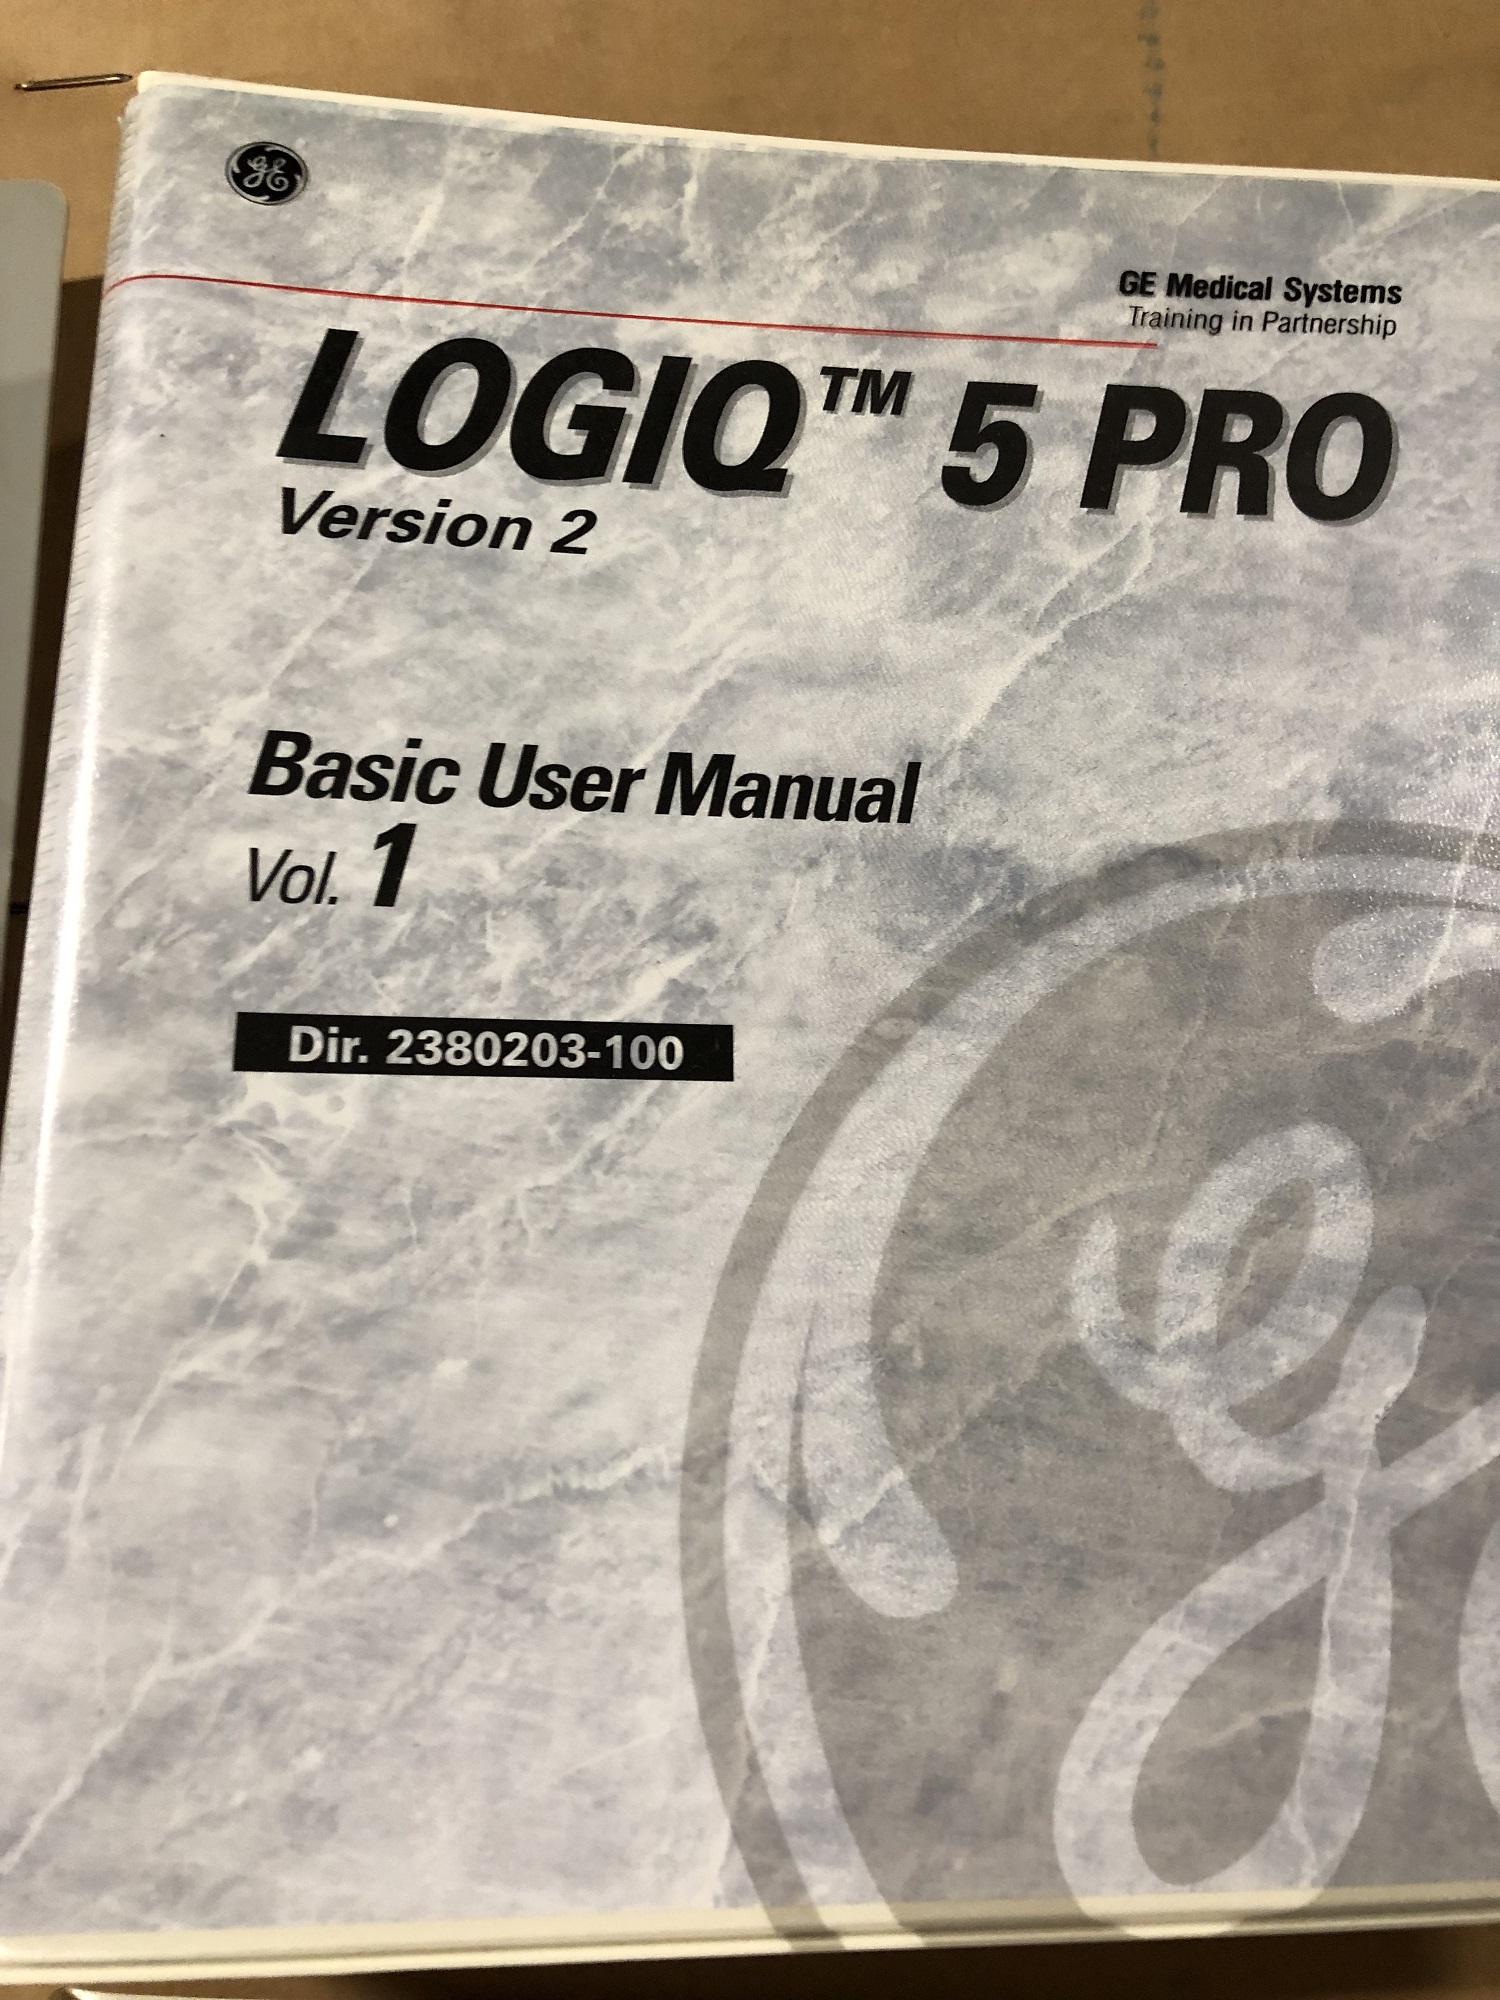 Krautkramer usn 50 manual ebook array ge 29869ge2 answering machine manual ebook rh ge 29869ge2 answering machine manual ebook mo fandeluxe Choice Image